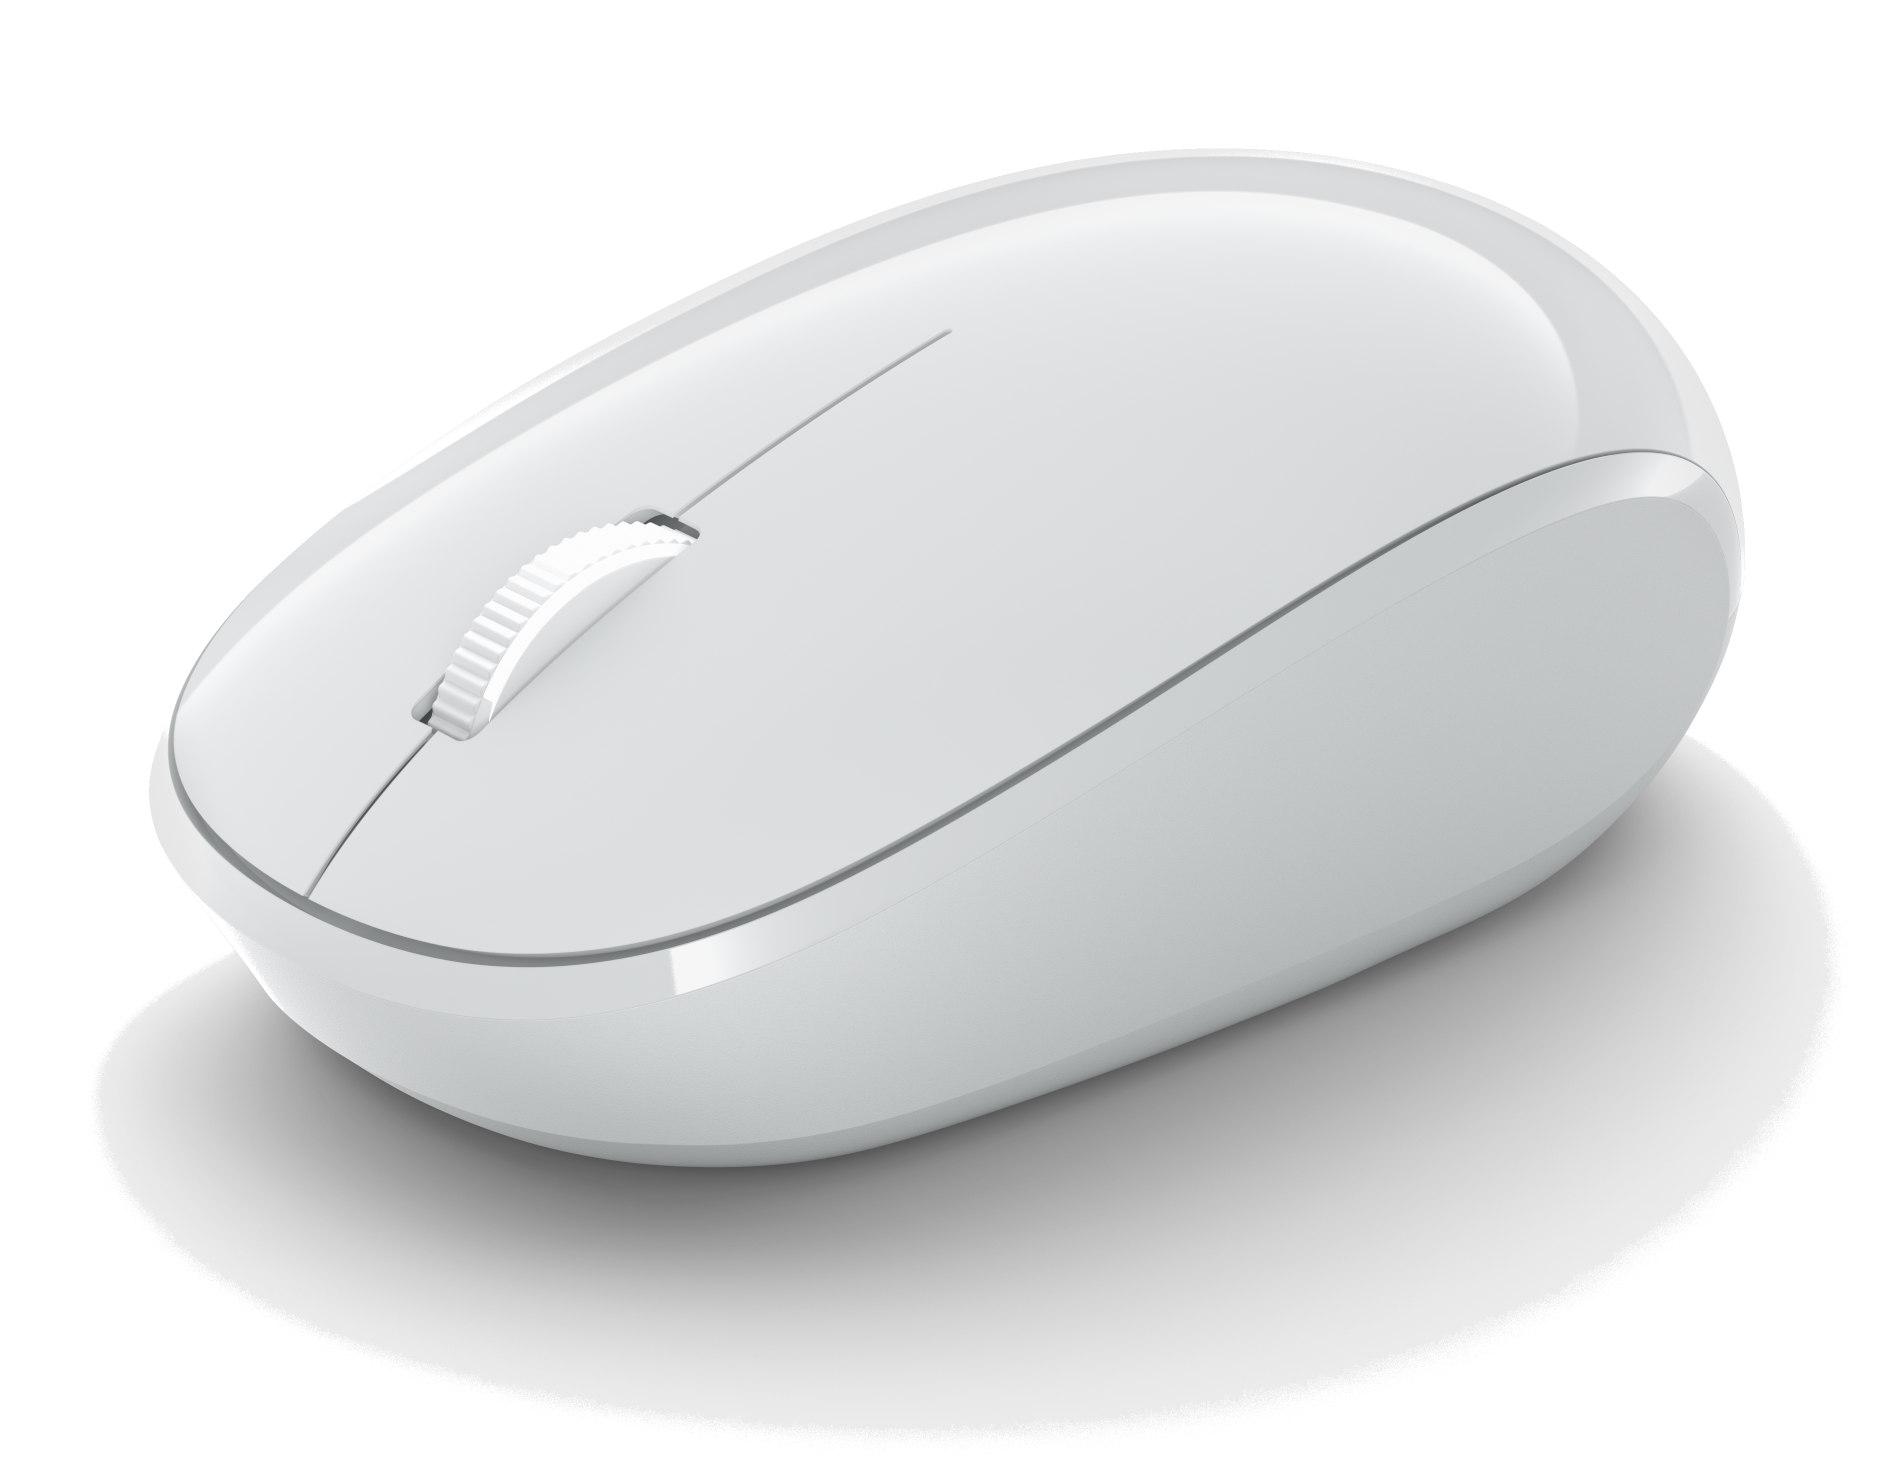 Microsoft Bluetooth Mouse, Glacier - RJN-00066